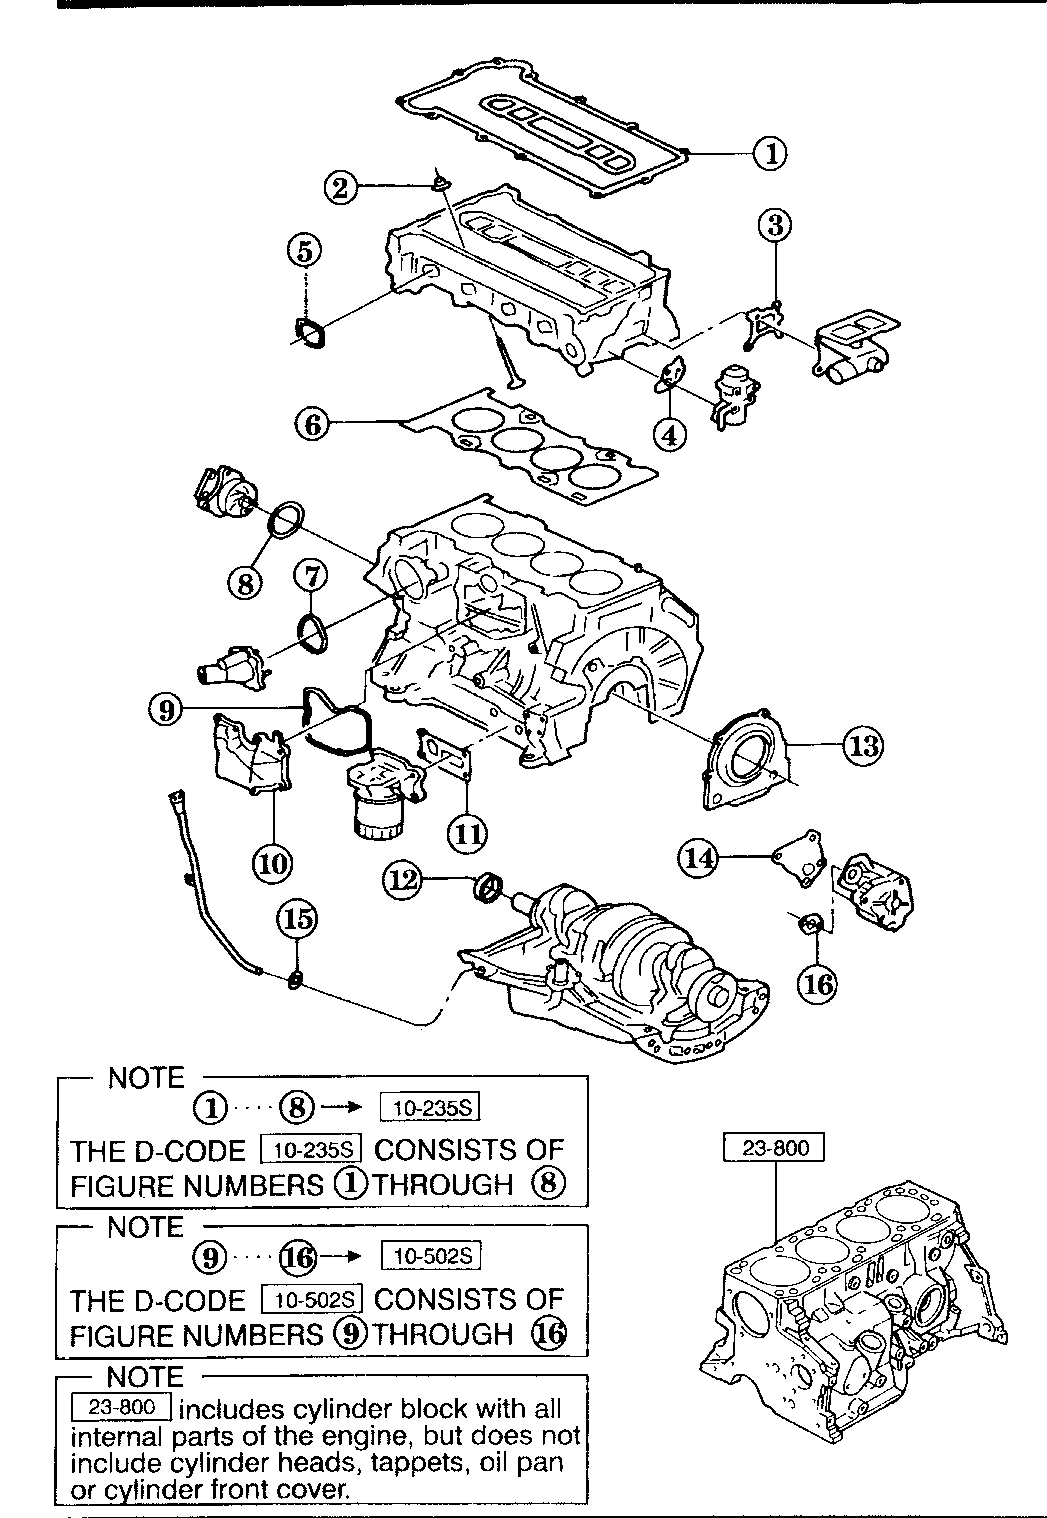 Mazda 1F30-10-235 Engine Cylinder Head Gasket Set